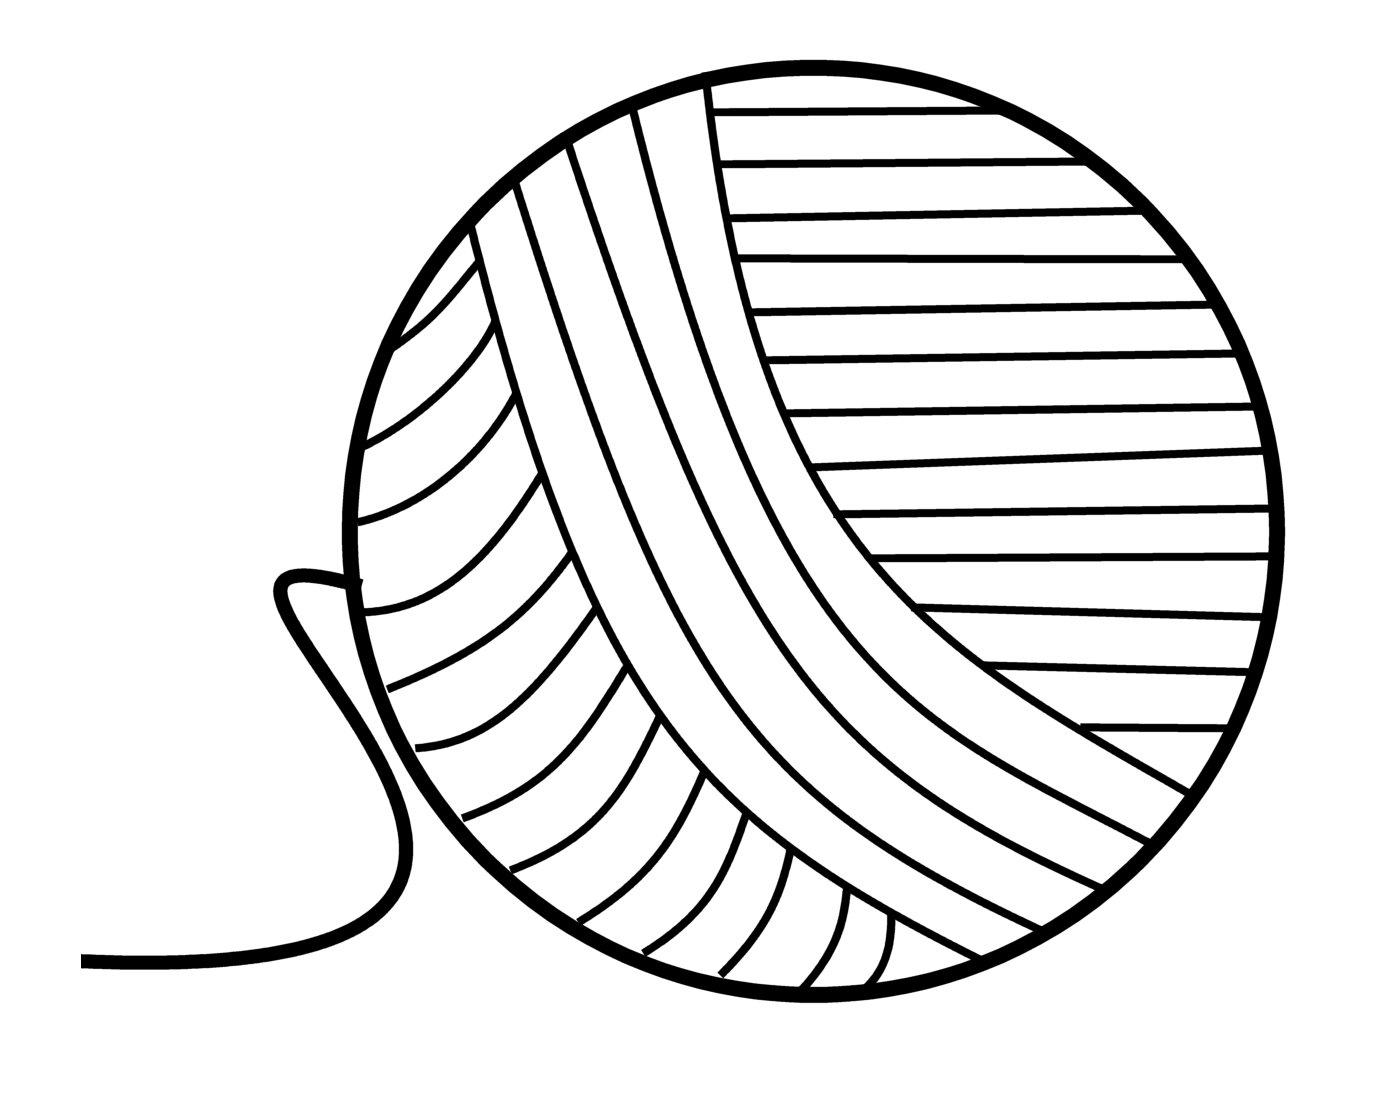 1392x1107 Ball Of Yarn Drawing Vector Image Ball Yarn Knitting Needles Stock